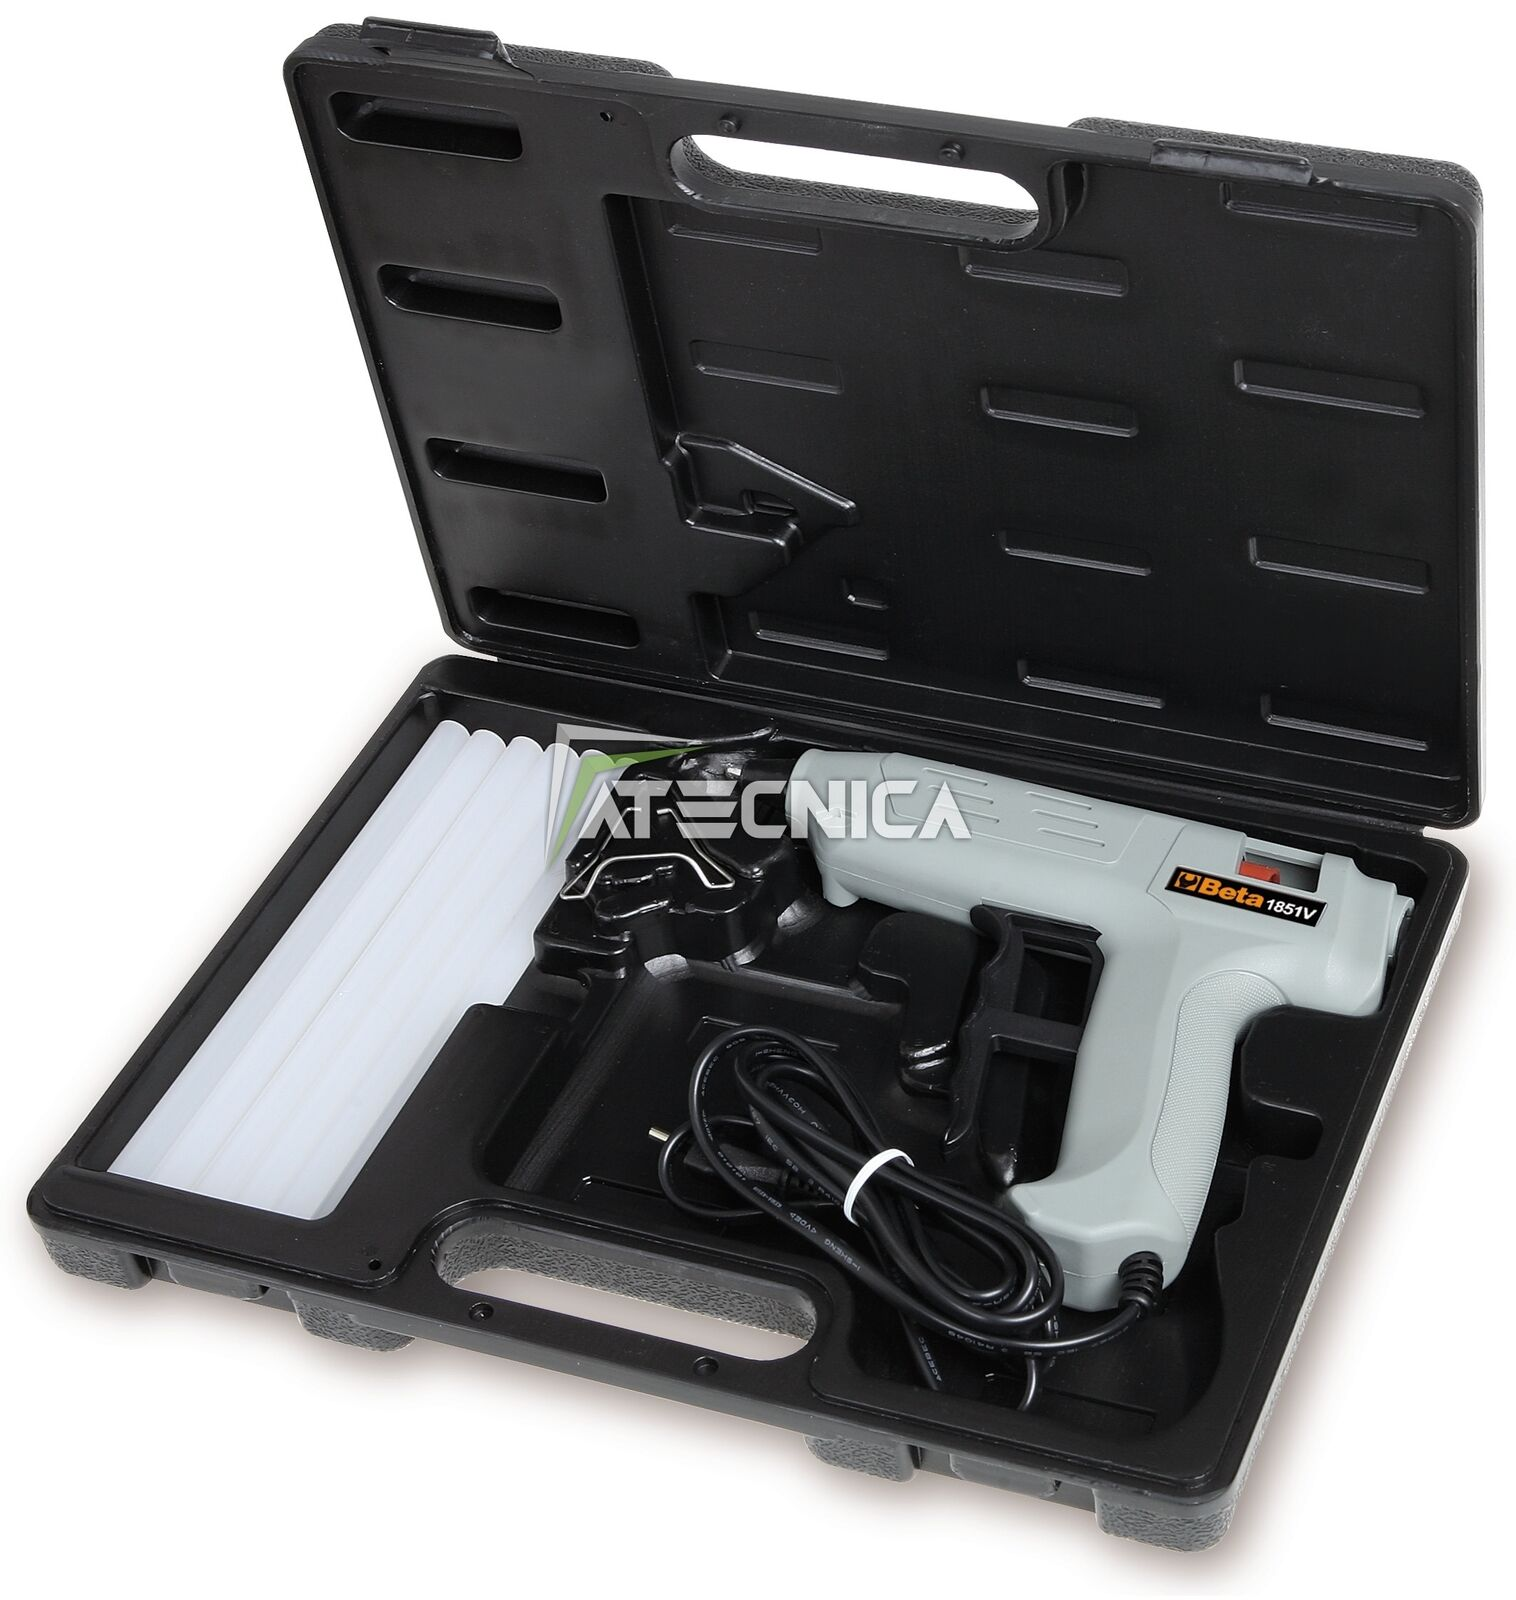 Pistola pegamento caliente beta tools 1851vk en valija 12 palillo recarga